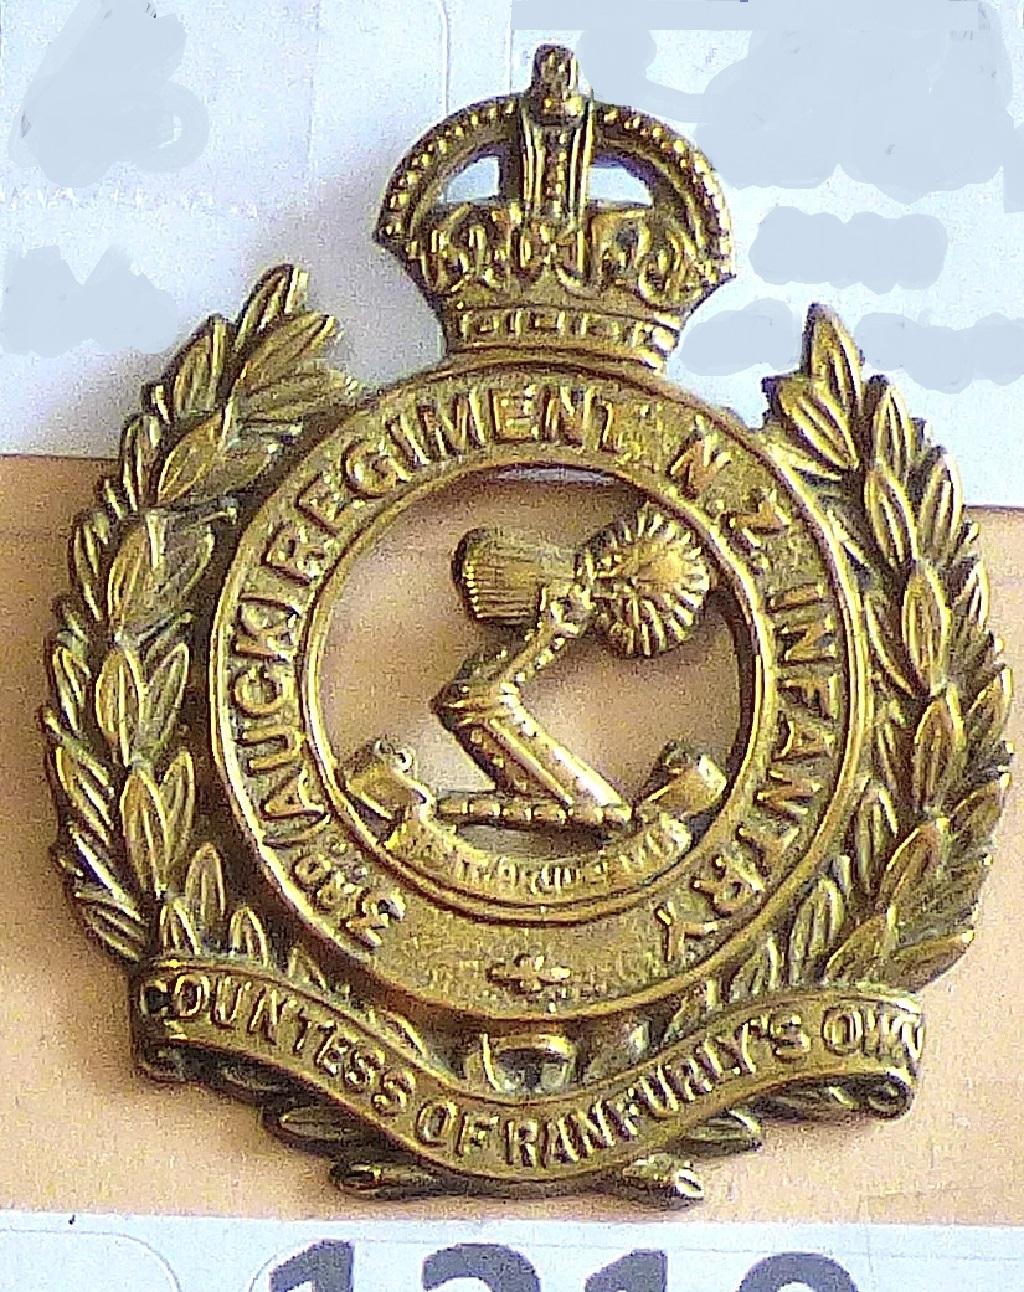 Lot 517 - New Zealand - 3rd (Auckland) Regiment - (Countess of Ranfurly's Own), Brass KC